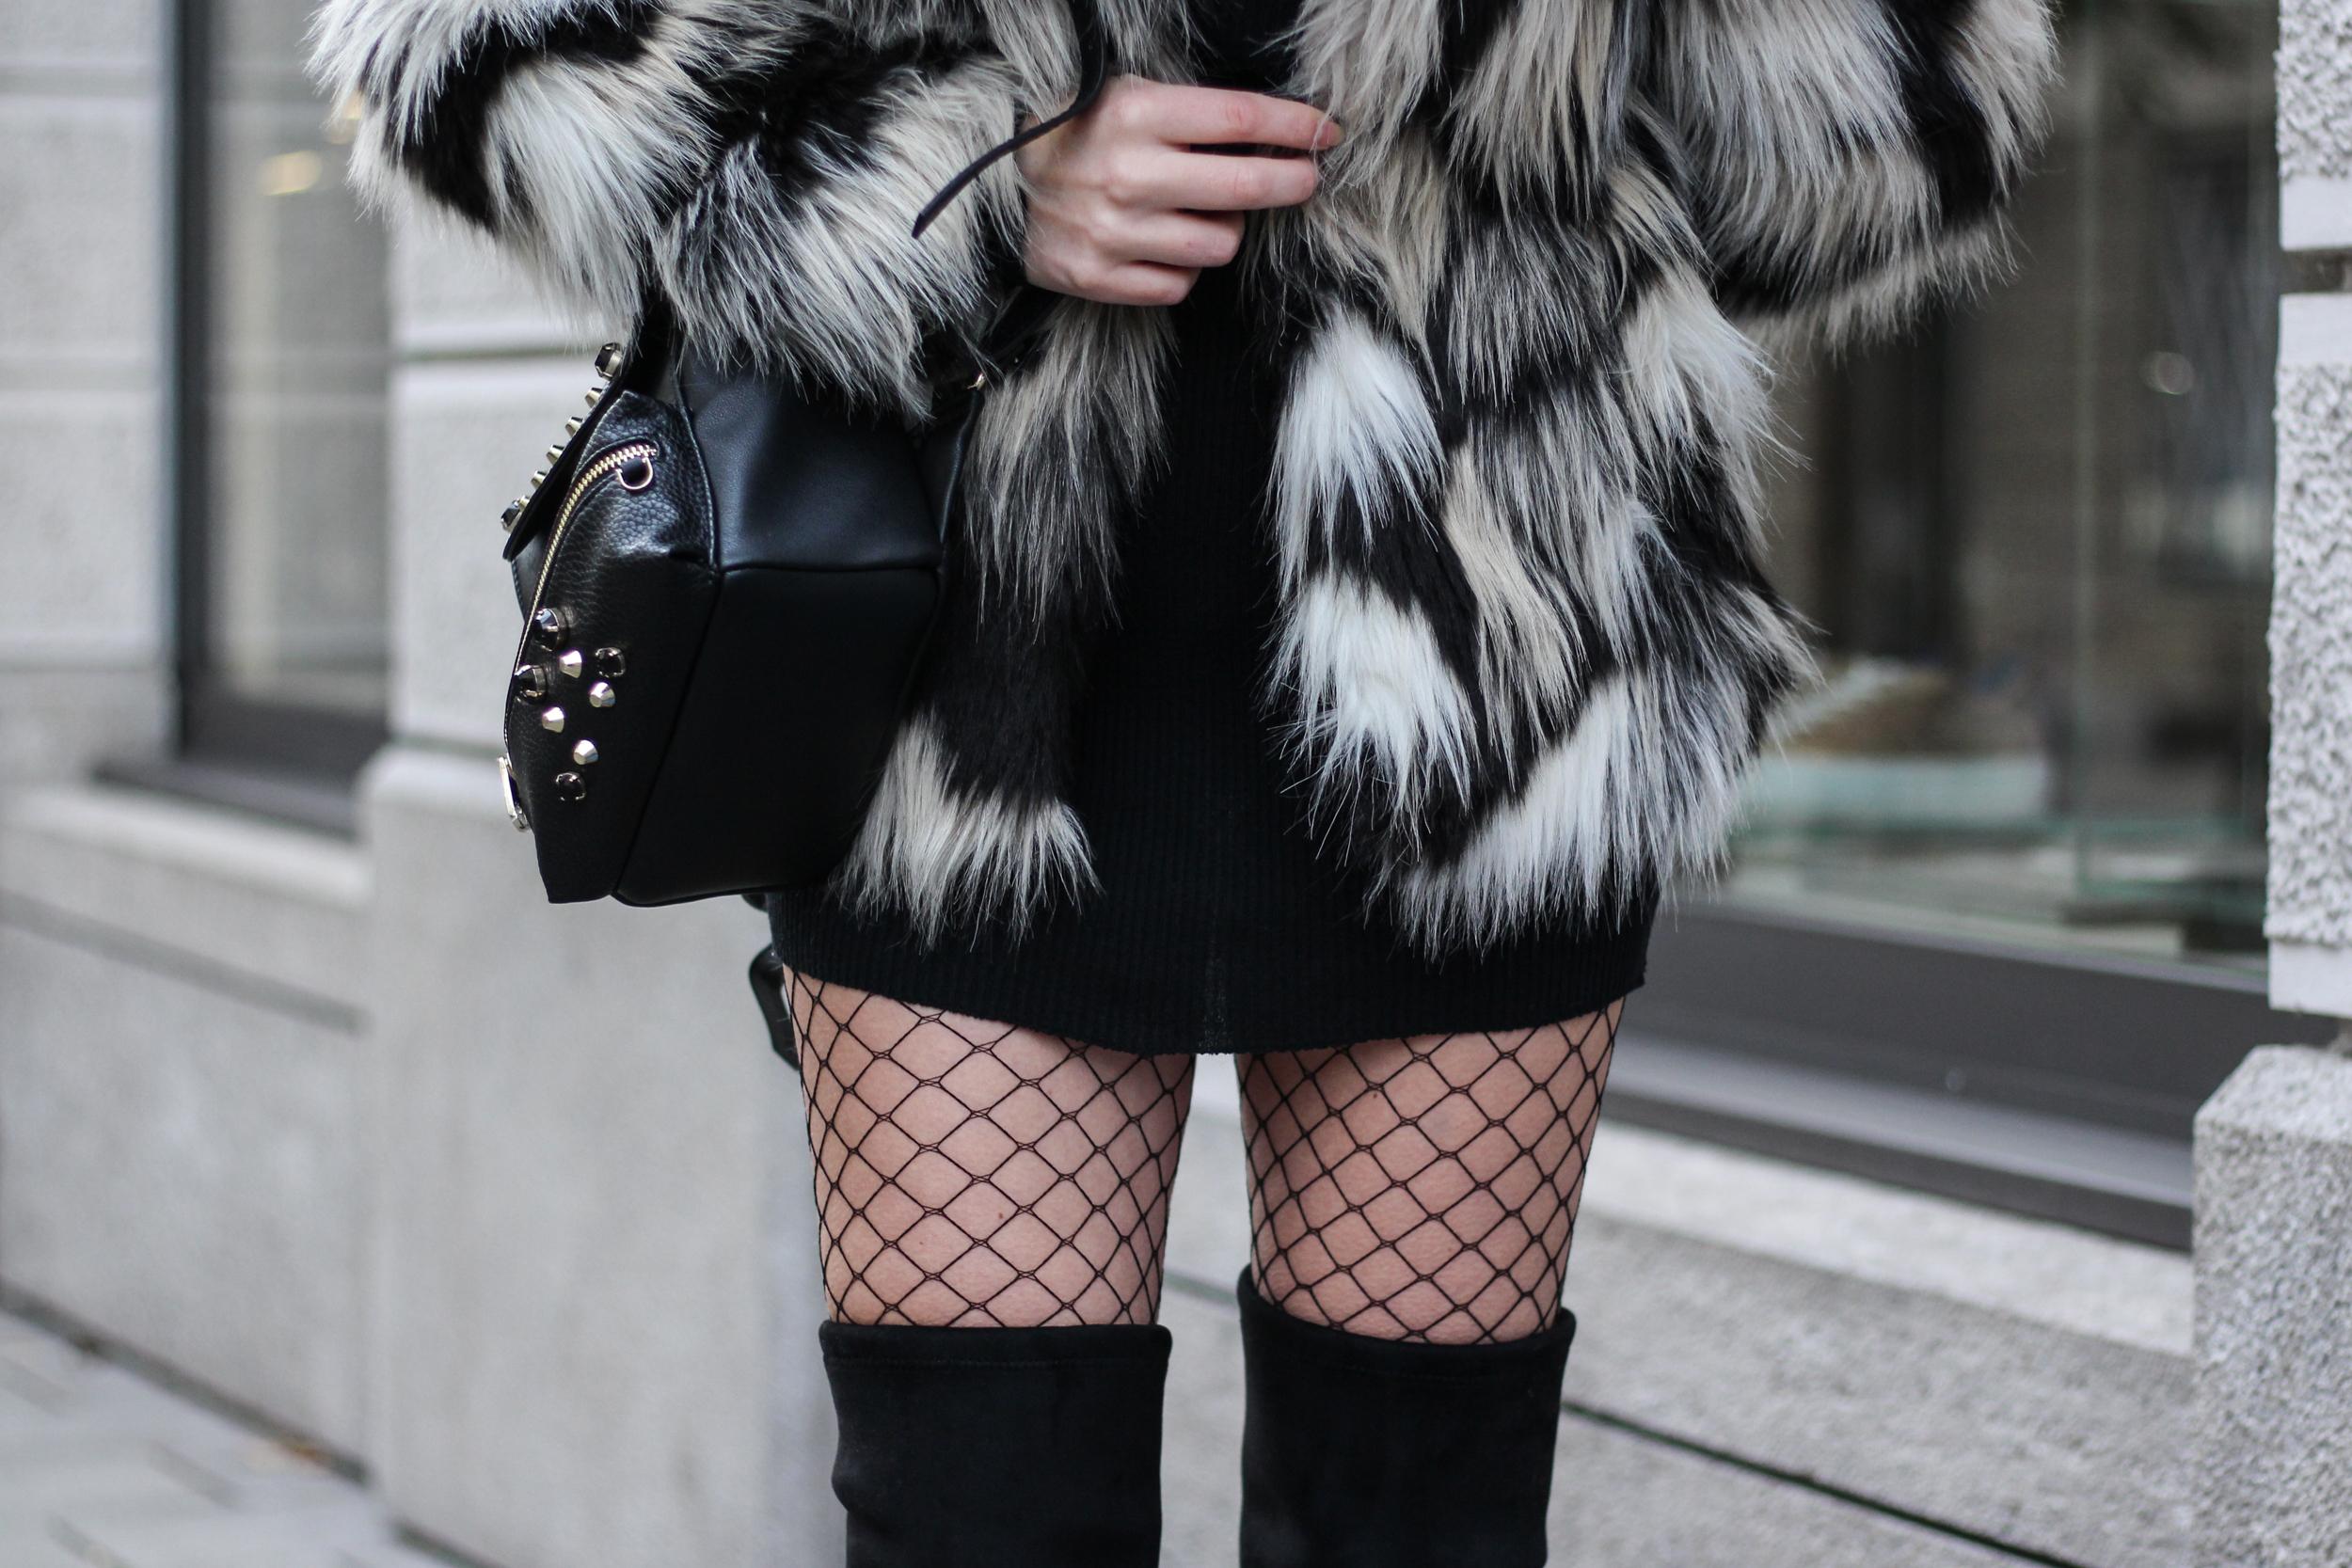 franziska-elea-blogger-aus-muenchen-fake-fur-jacke-netzstrumpfhose-overknee-stiefel-guess-lederrucksack-minirucksack-strumpfhose-kariert-details